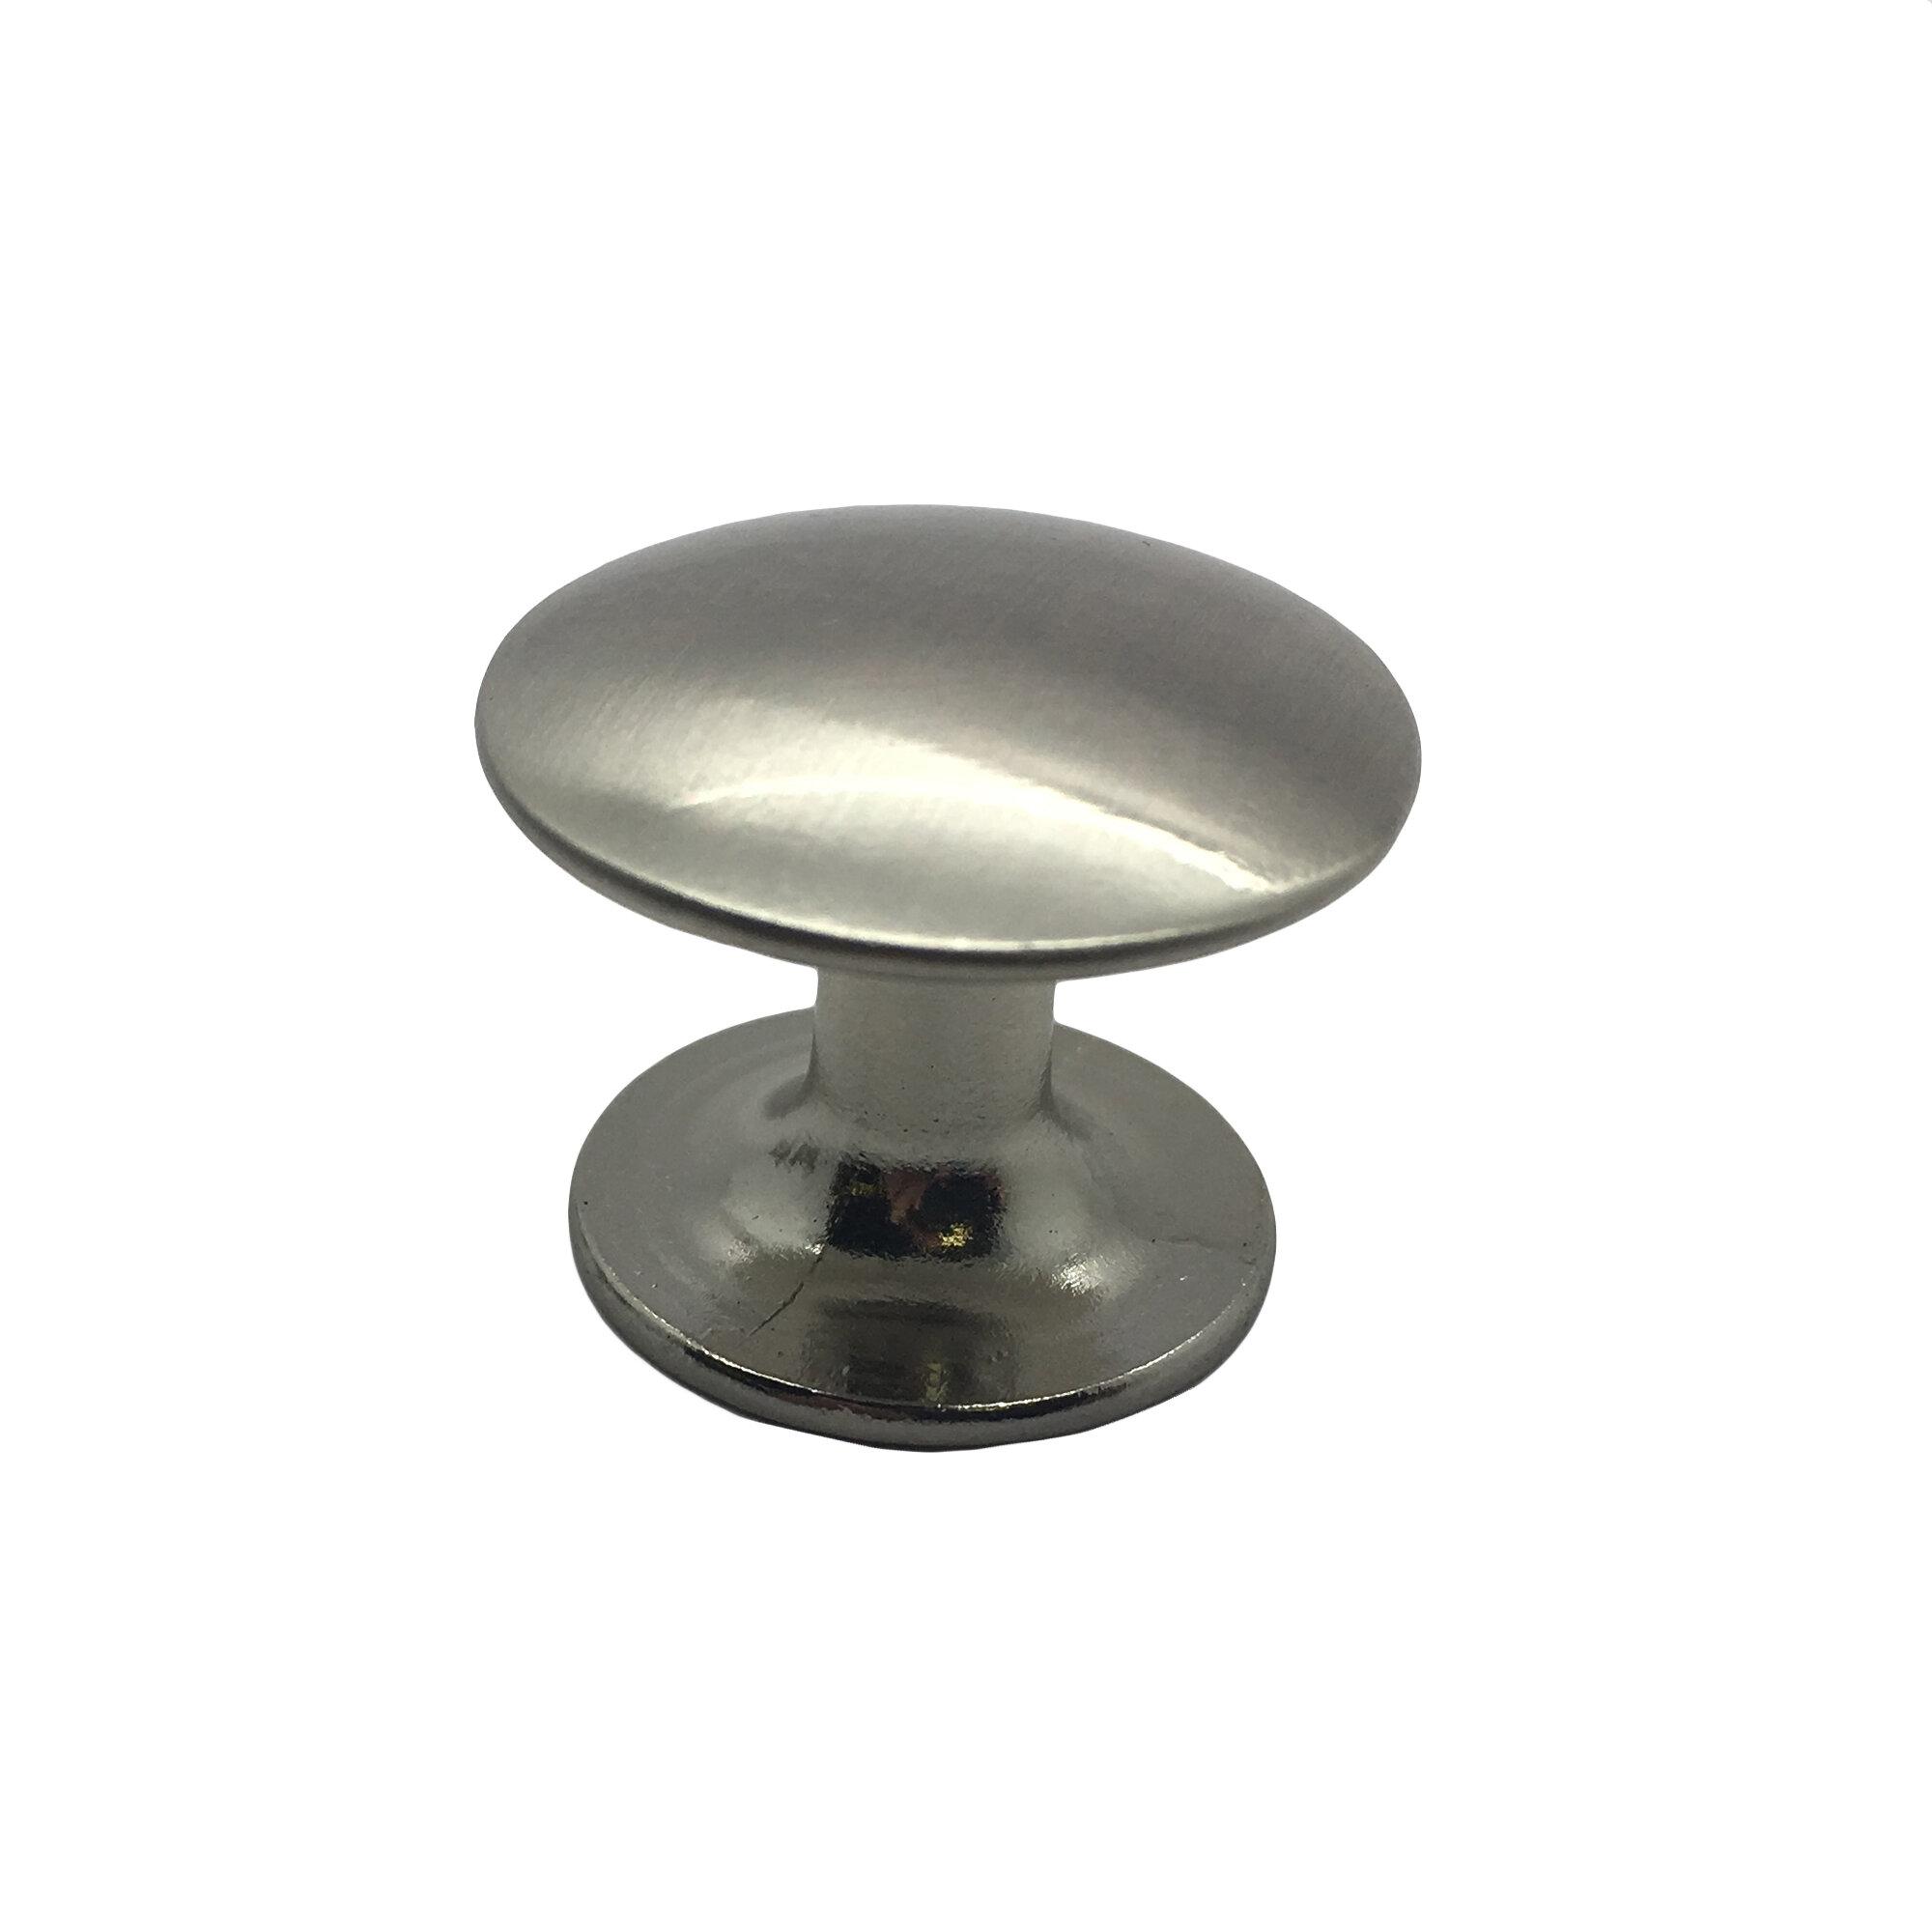 Details About Kitchen Cabinet Door Drawer Knob Flush Metal Pull Handle Round Knob Multipack